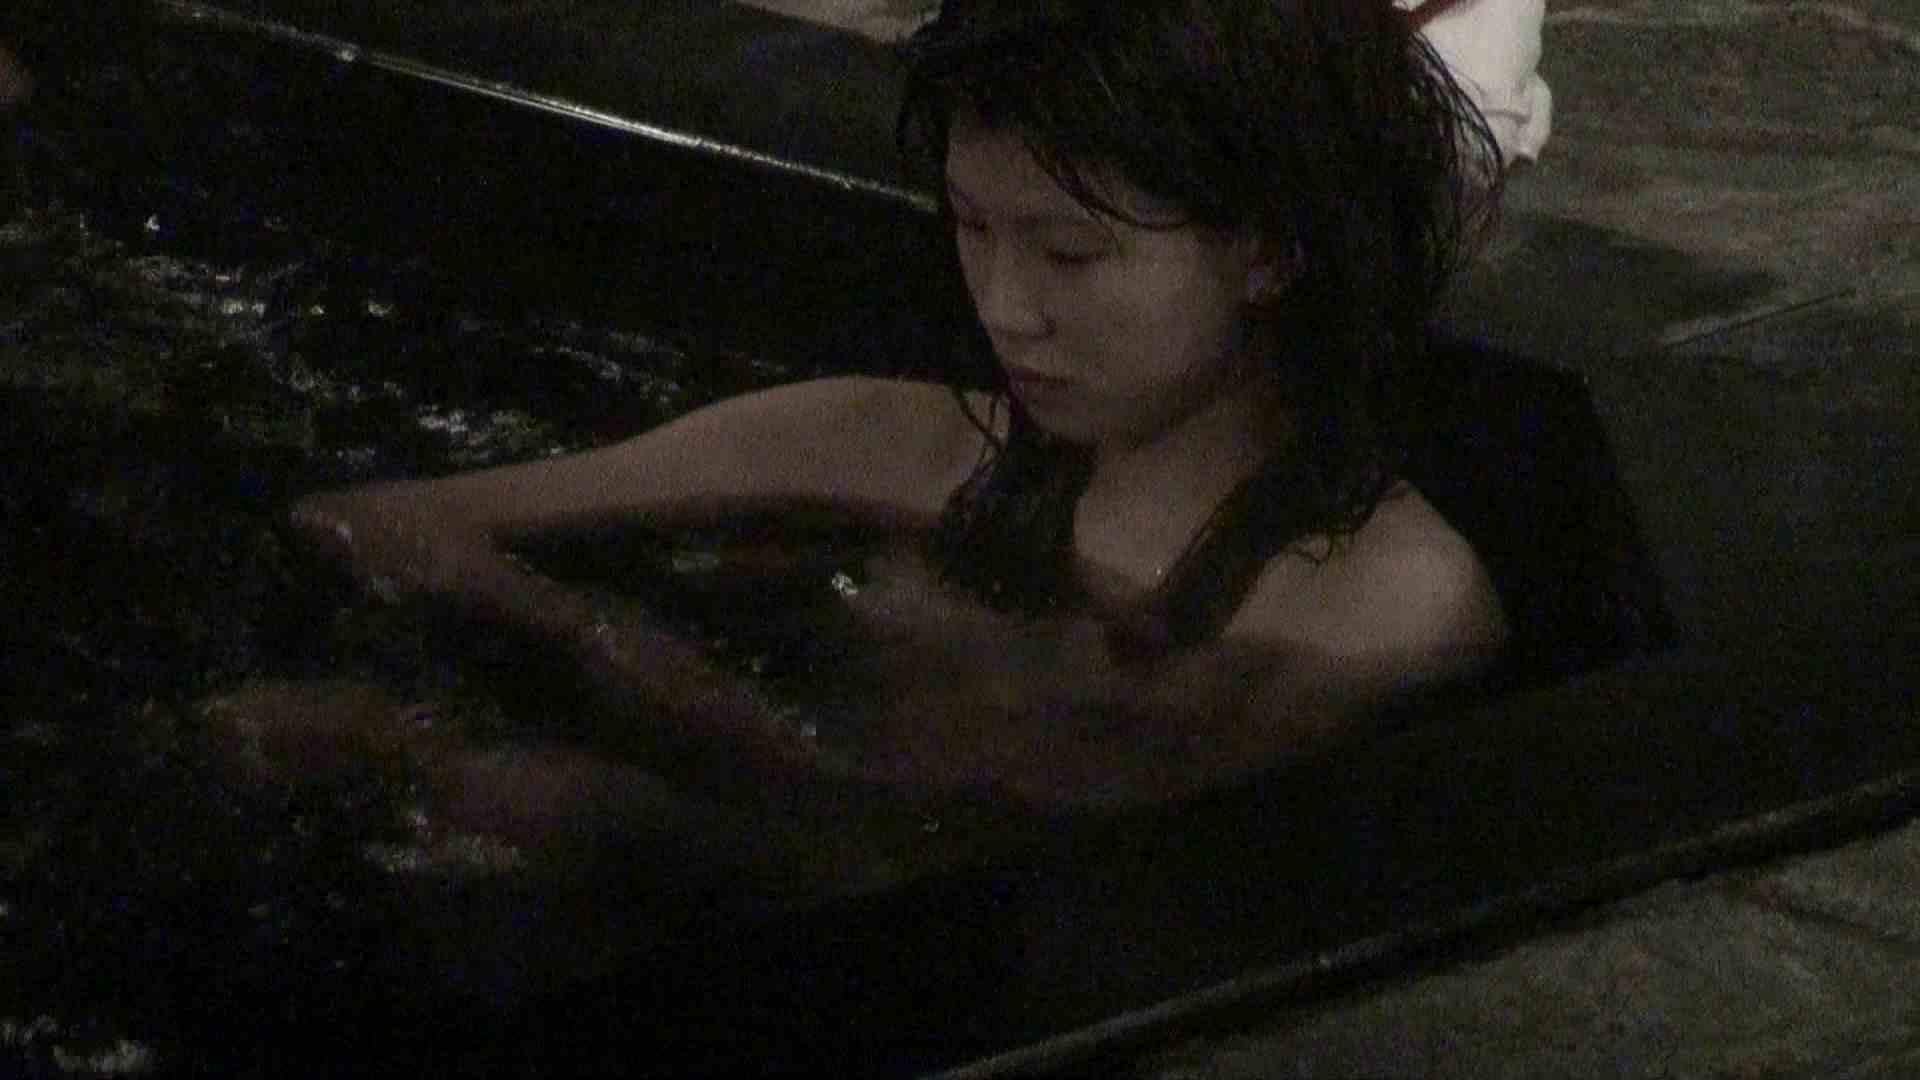 Aquaな露天風呂Vol.371 0  92連発 90